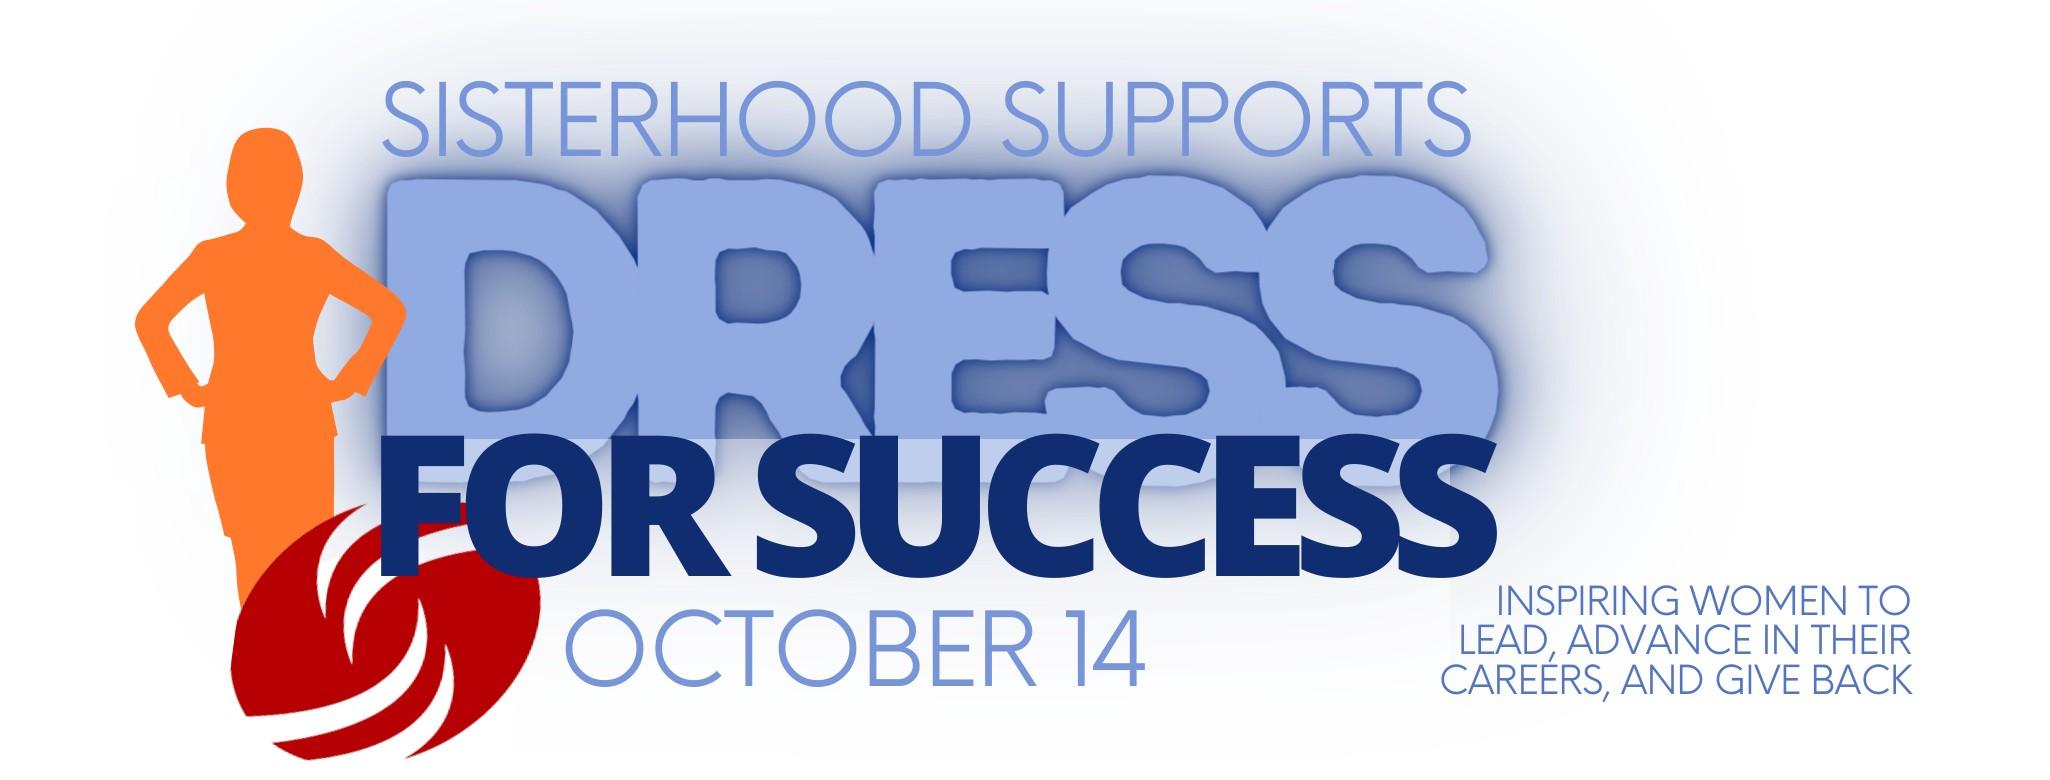 "<a href=""https://www.templebethel.com/event/sisterhood-supports-dress-for-success.html""                                     target="""">                                                                 <span class=""slider_title"">                                     6:00pm                                </span>                                                                 </a>                                                                                                                                                                                      <a href=""https://www.templebethel.com/event/sisterhood-supports-dress-for-success.html"" class=""slider_link""                             target="""">                             More Information                            </a>"